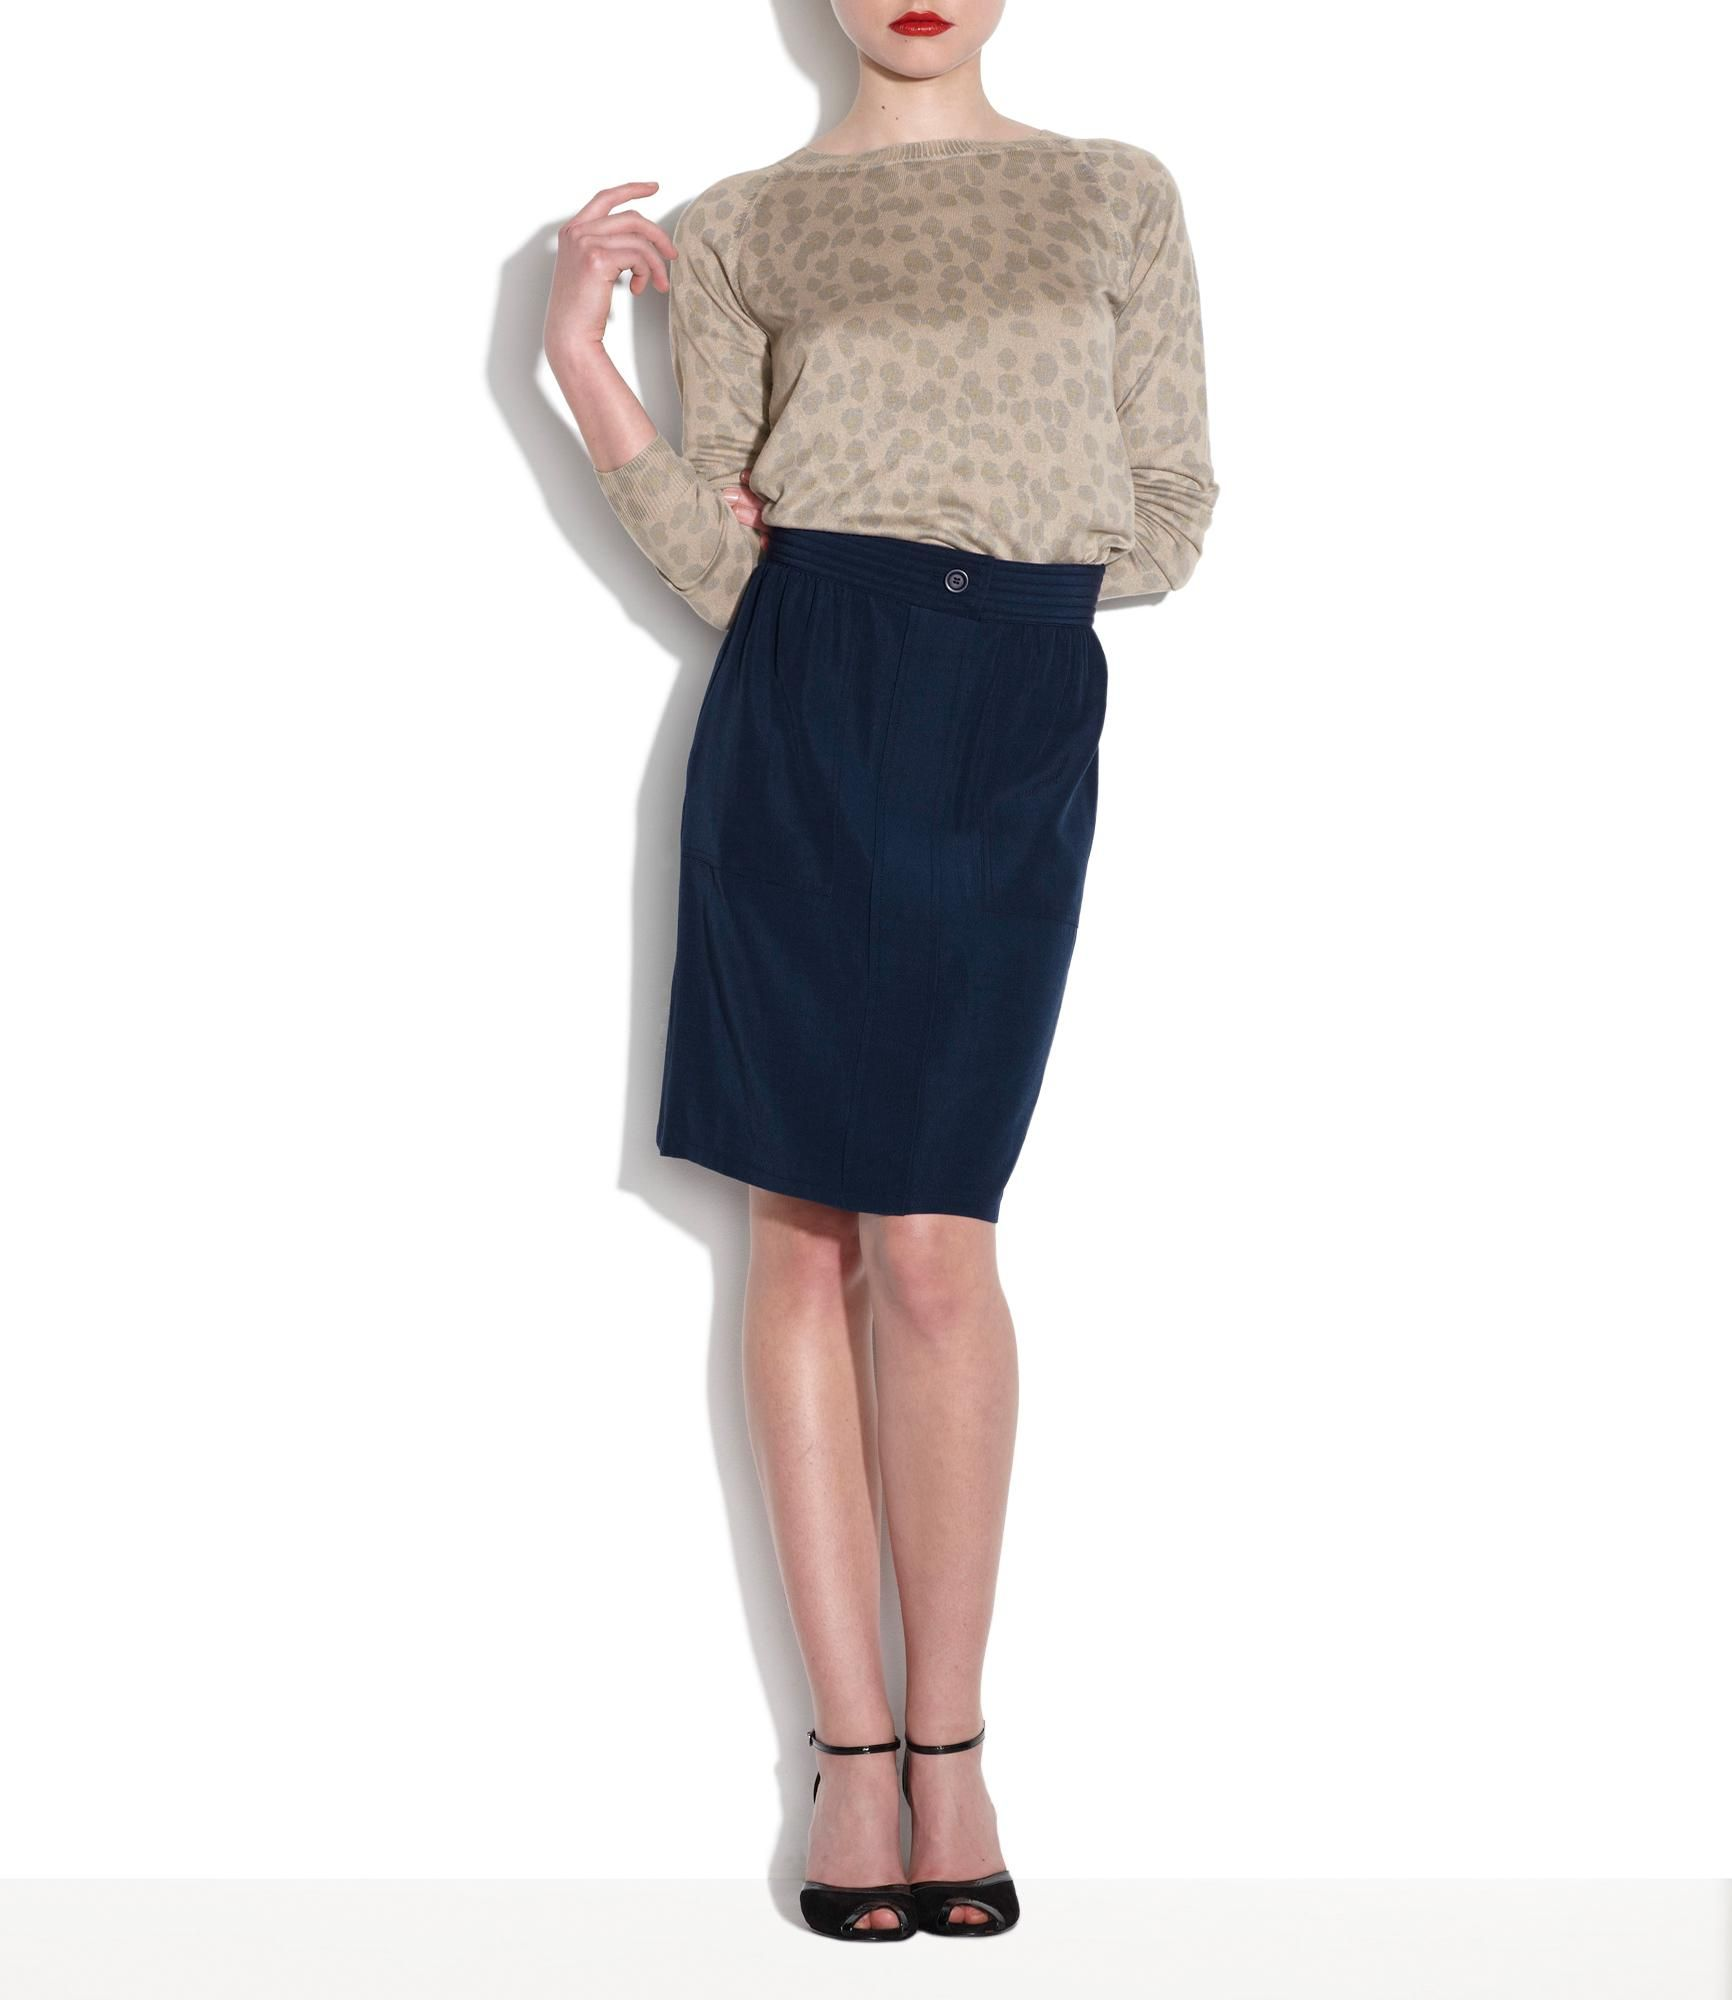 Safari skirt Textured fabric. Straight cut, slightly flared at bottom. Rather high waist. Hidden back zip closure. Cotton blend lining. €147